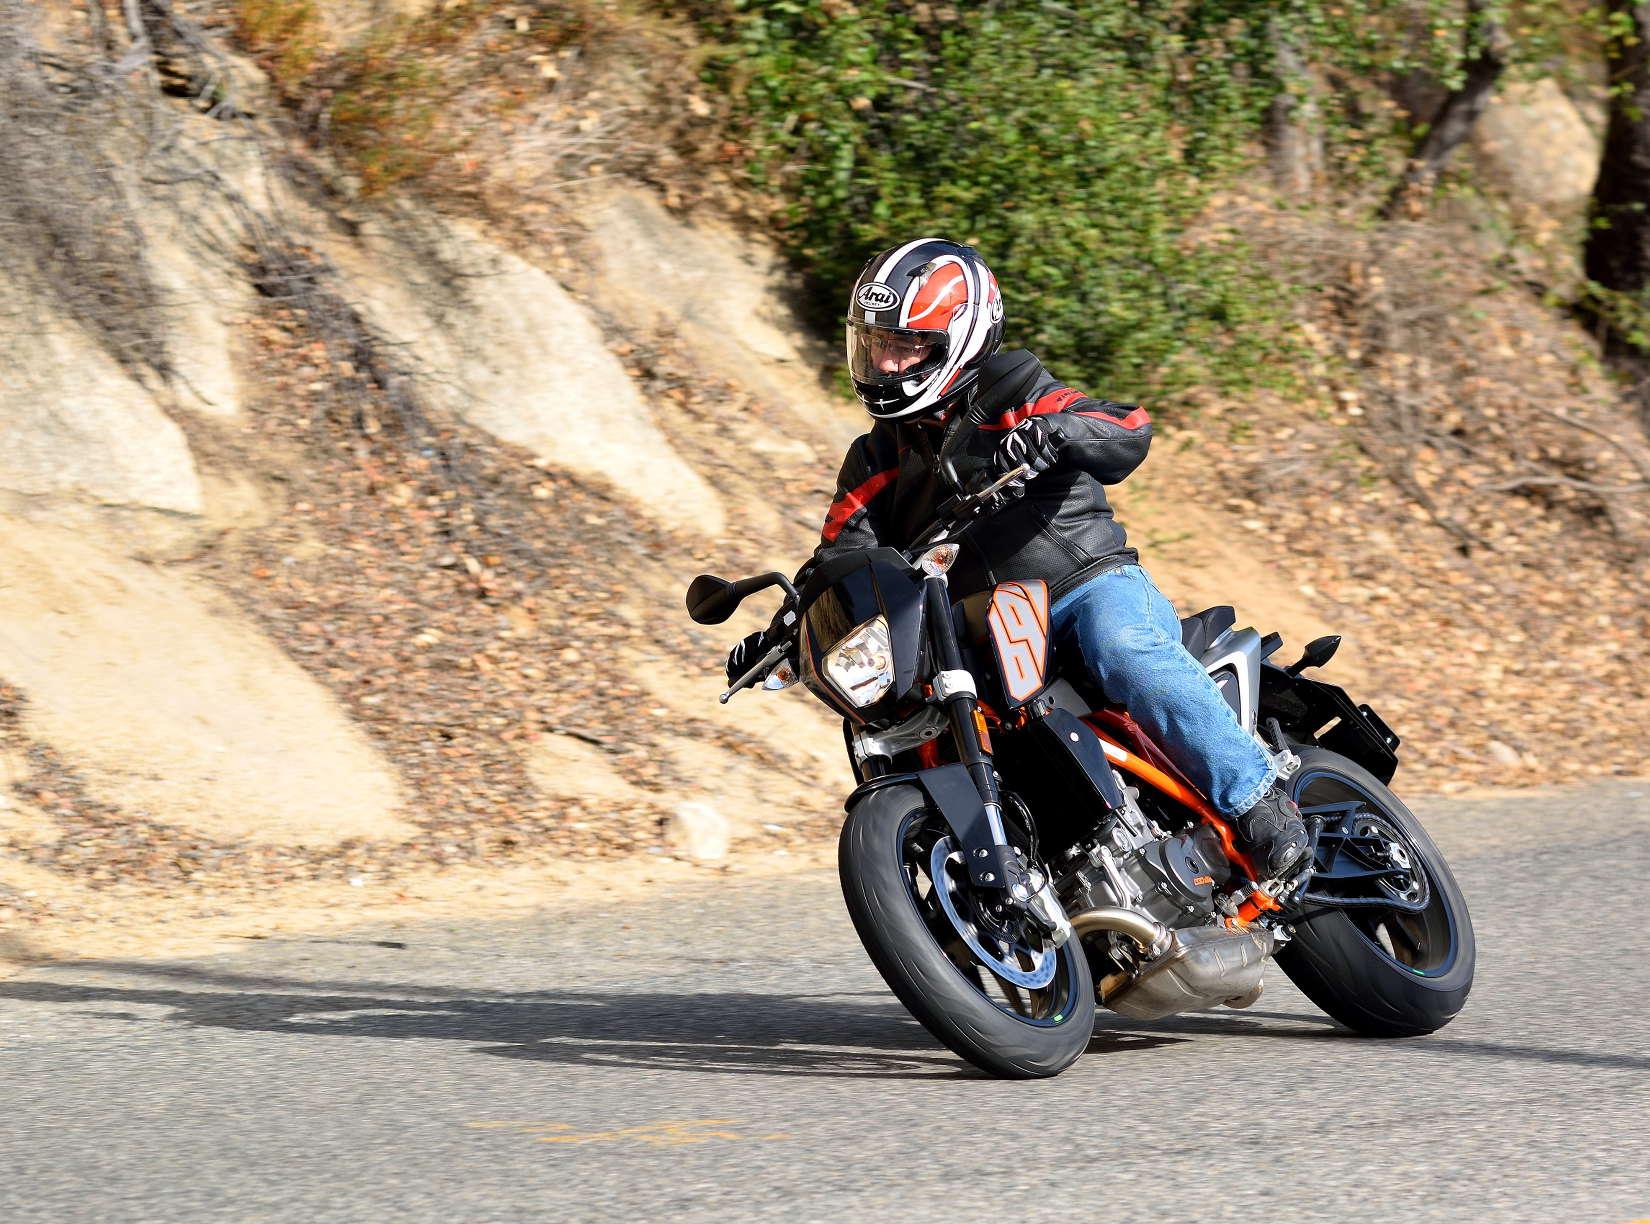 2014 KTM 690 Duke: MD Ride Review - MotorcycleDaily com